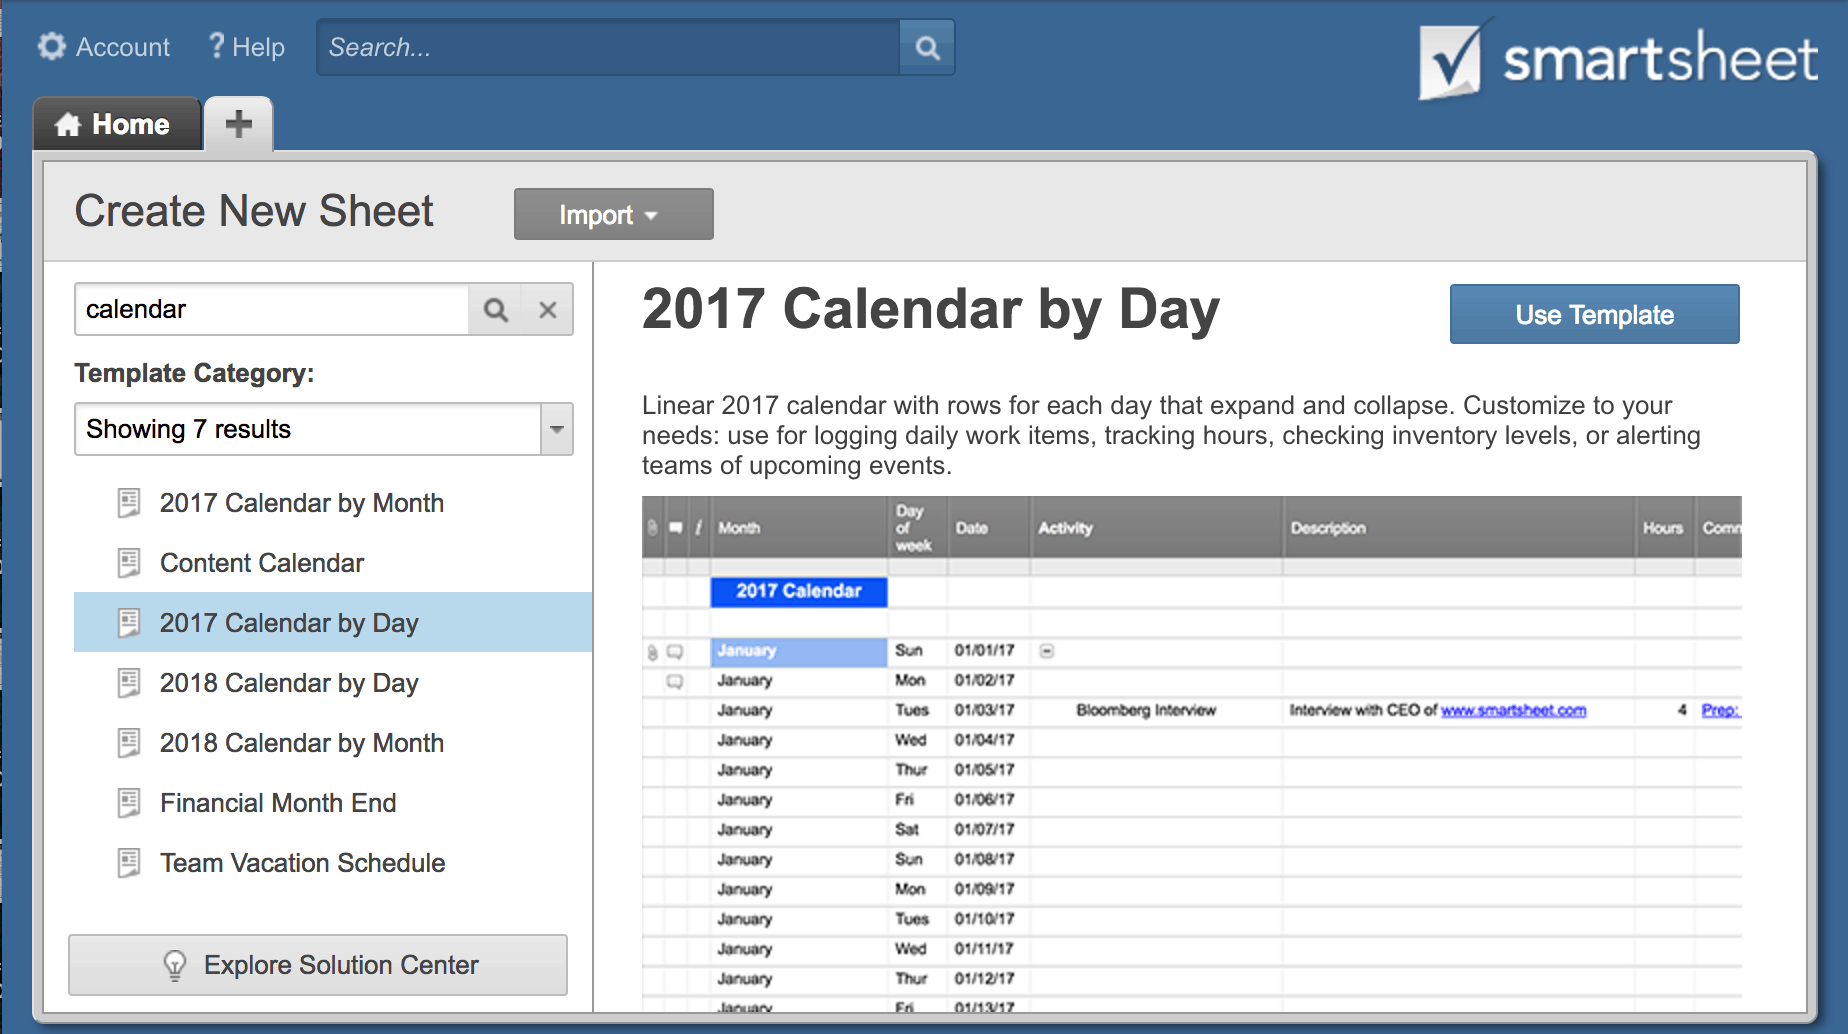 Calendar Templates Available In Smartsheet